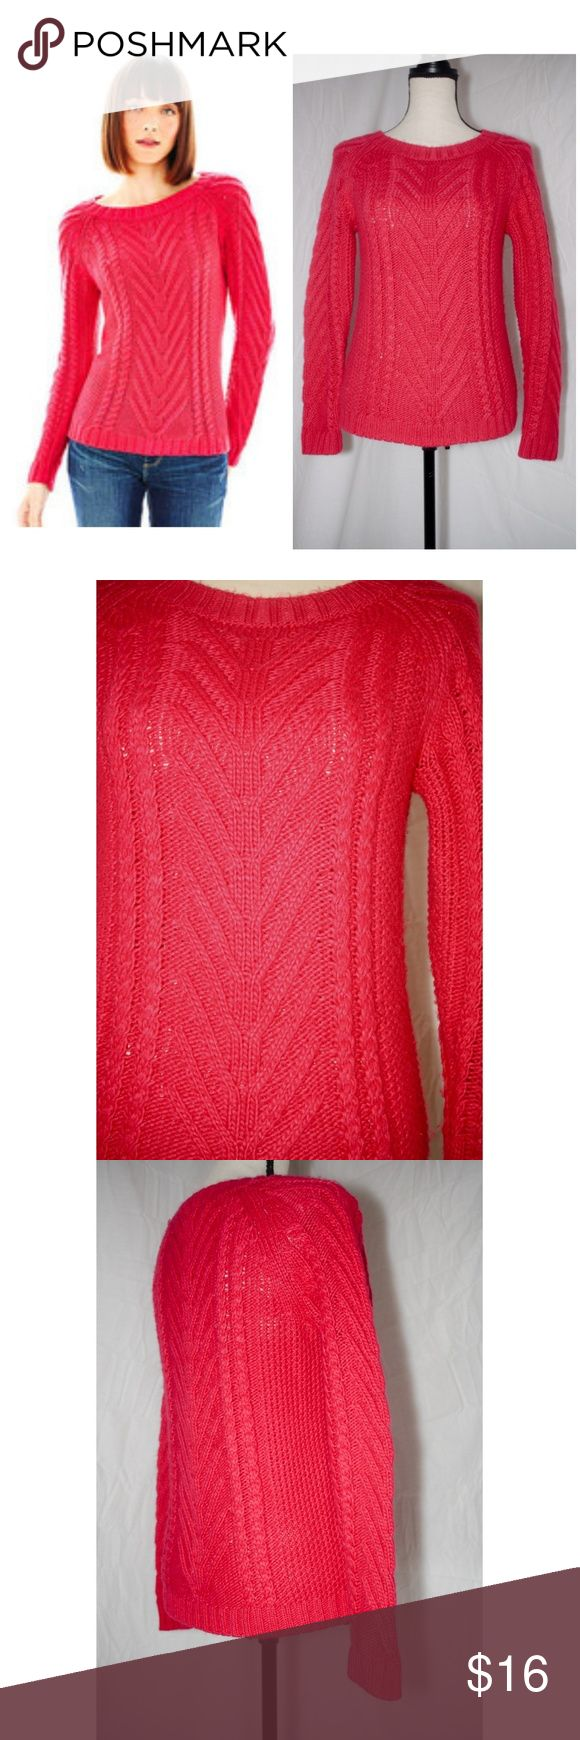 "Joe Fresh Cable Knit Sweater Fuzzy hot pink sweater by Joe Fresh. EUC.  Dress form measurements: Chest 34"" x Shoulders 36"" x Waist 27"" x Hips 36.5"" x Neck 12.5"" Joe Fresh Sweaters"